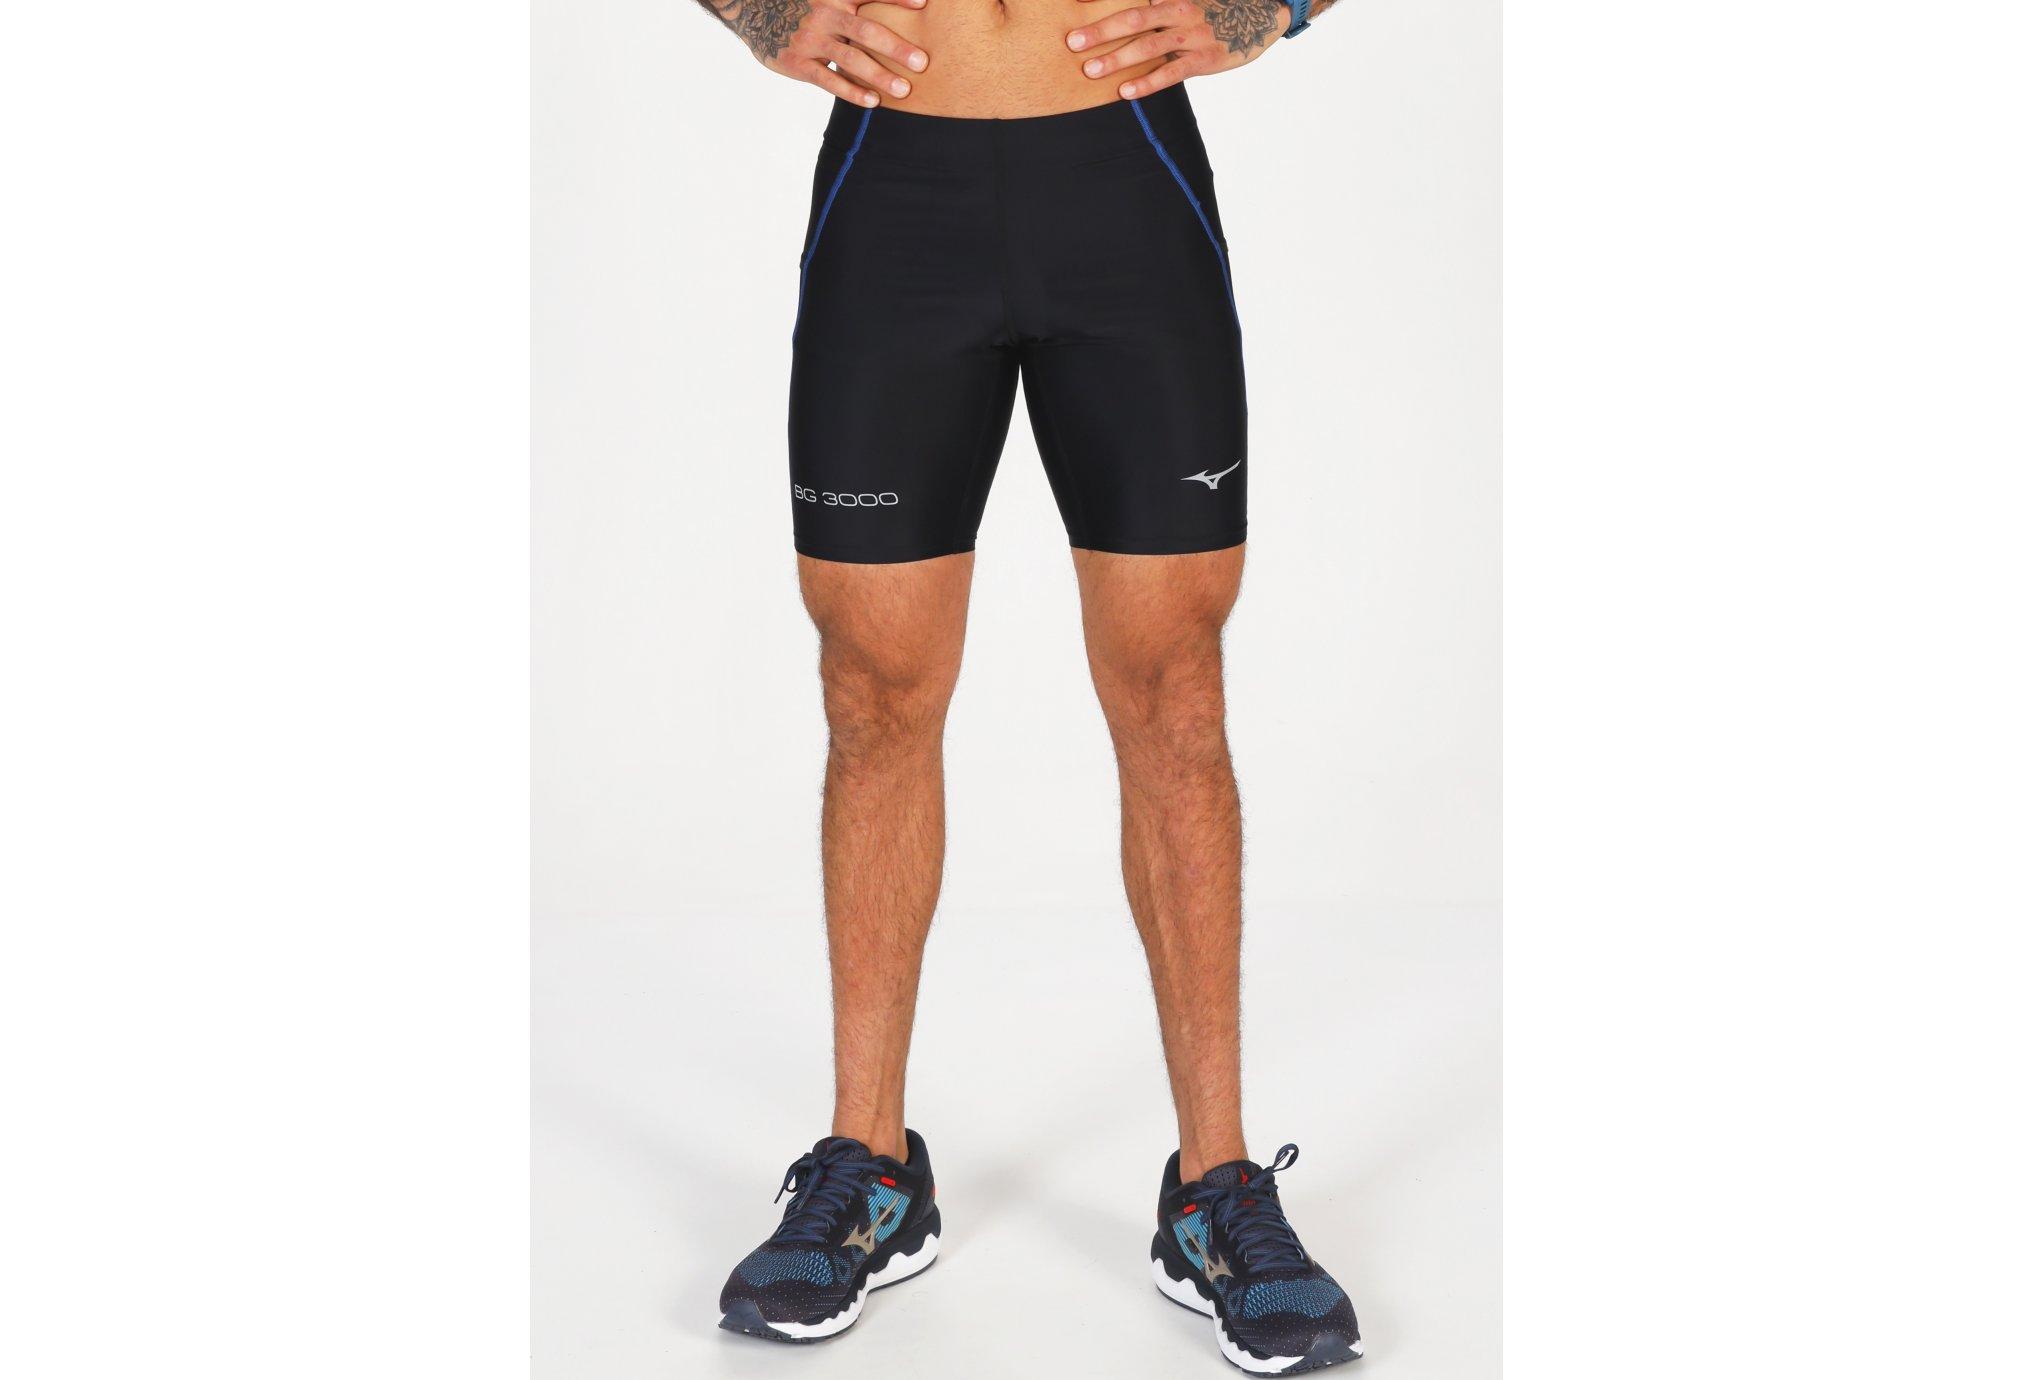 Mizuno BG3000 M vêtement running homme